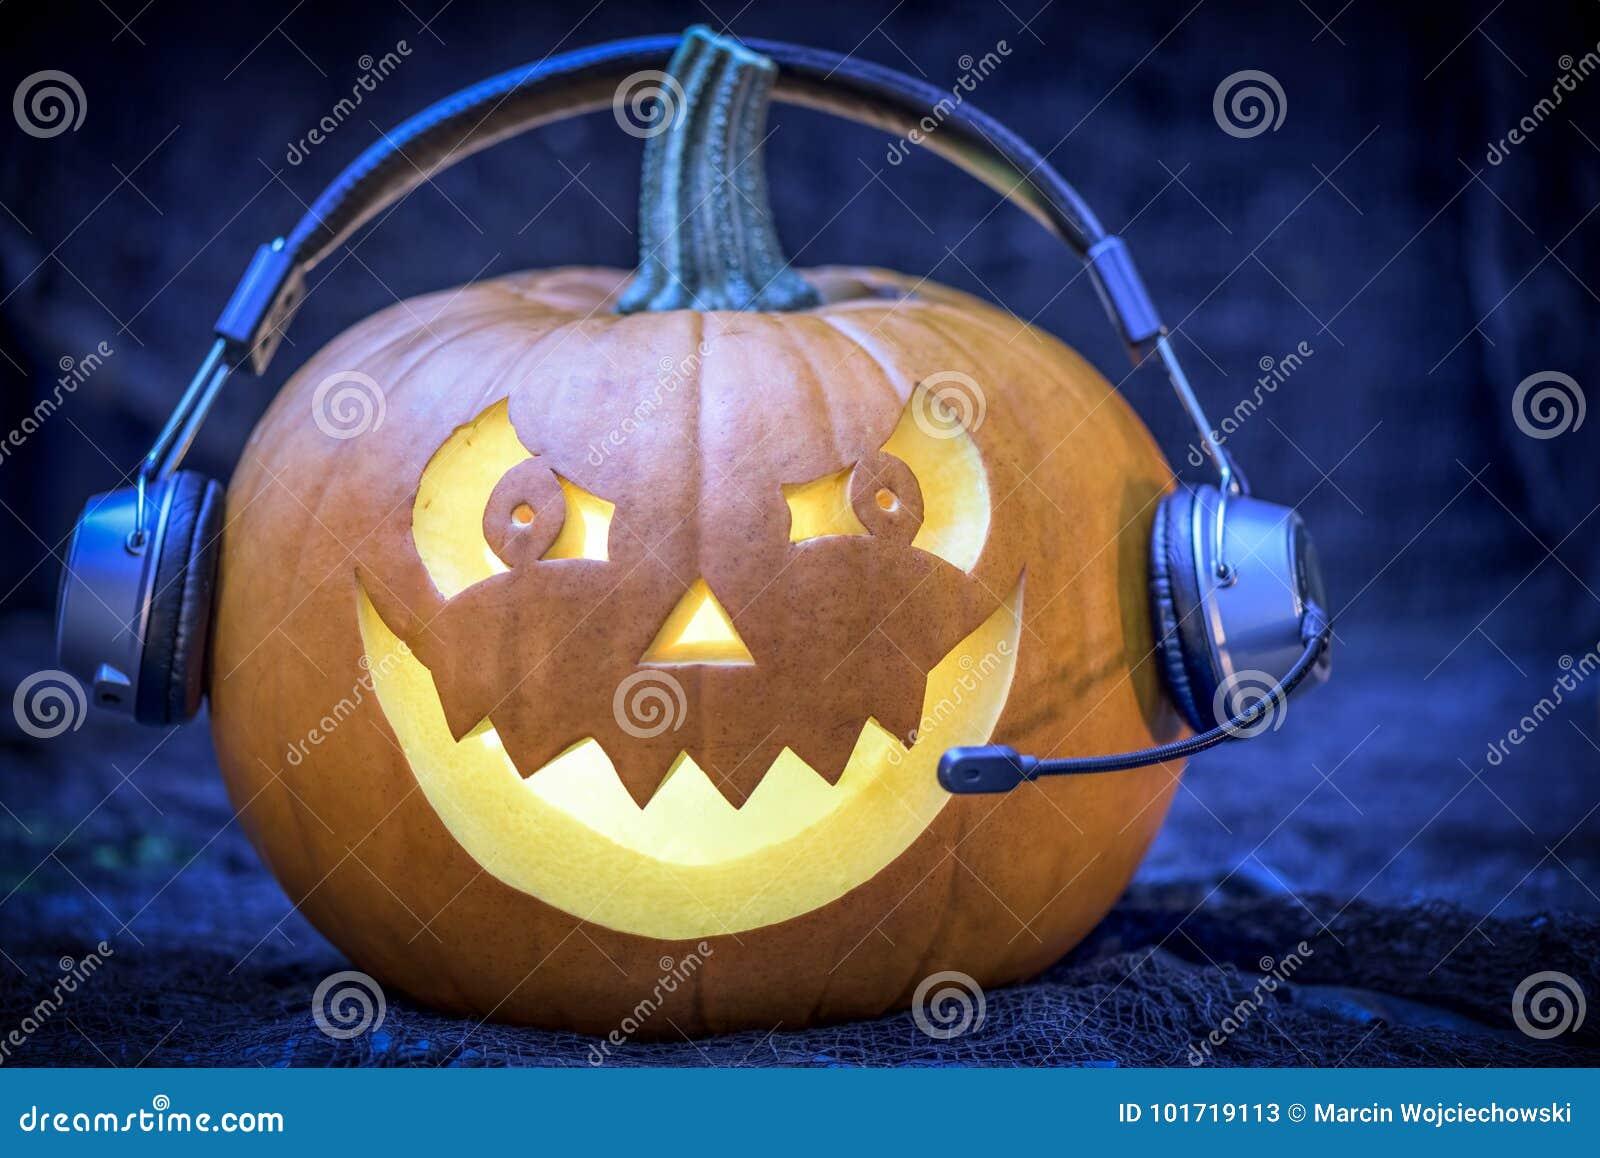 Тыква в наушниках - открытка хеллоуина